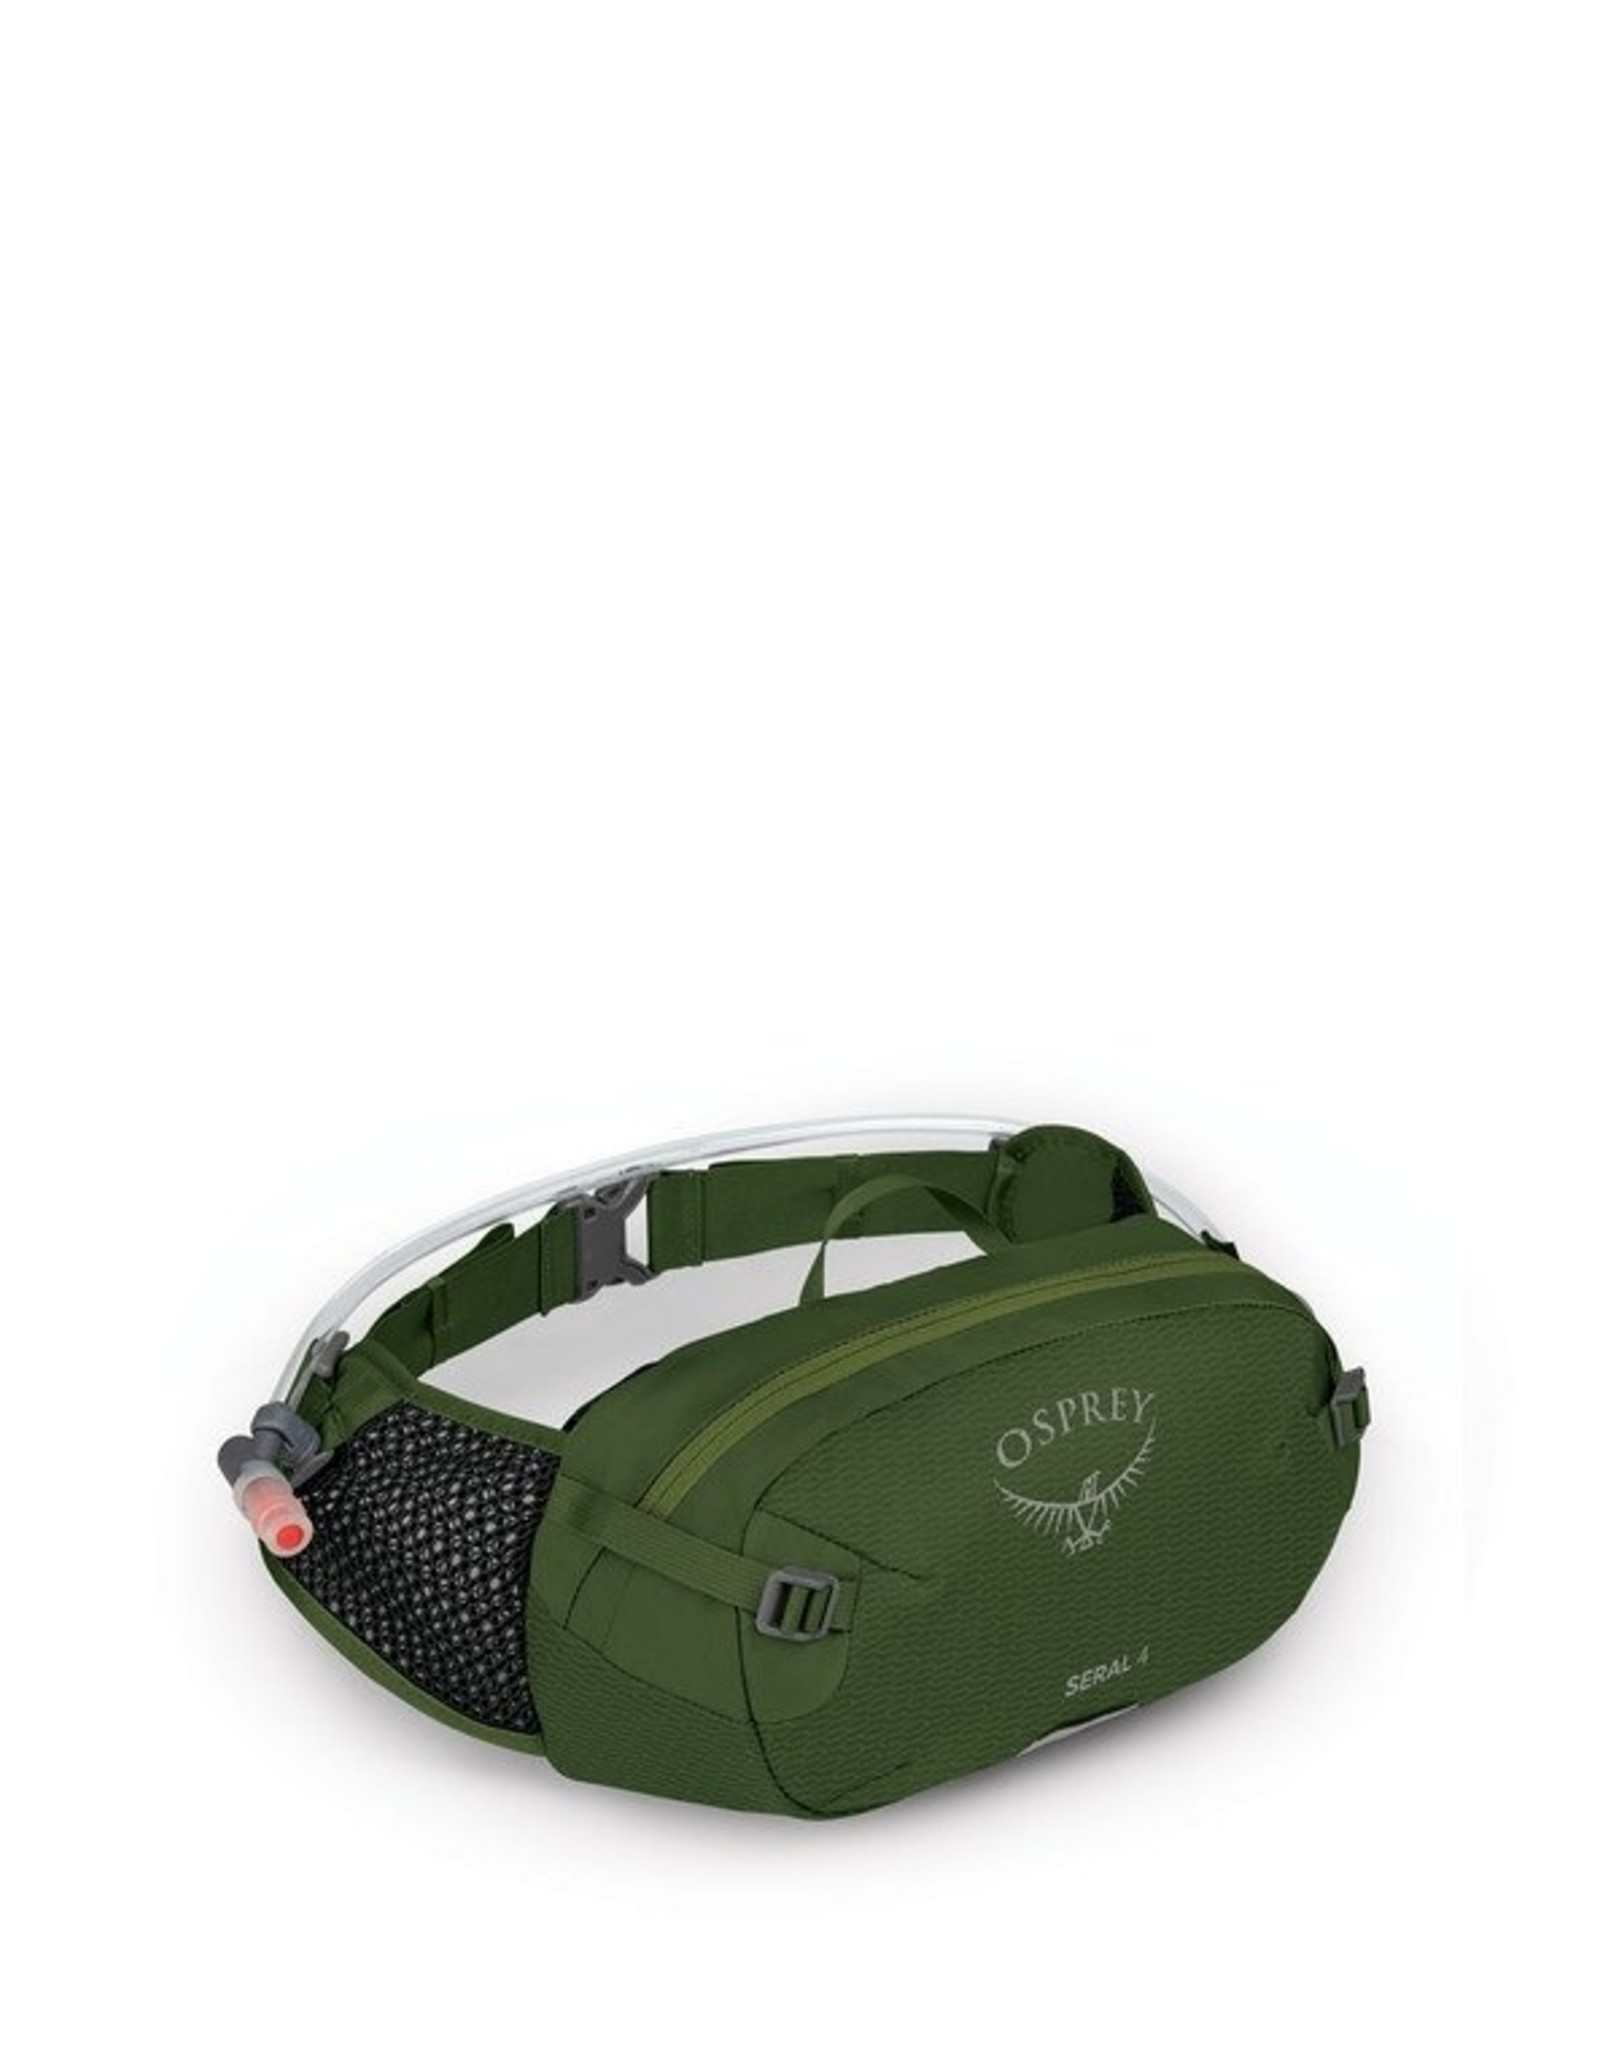 Osprey Osprey Seral 4 Lumbar Pack - Green, One Size